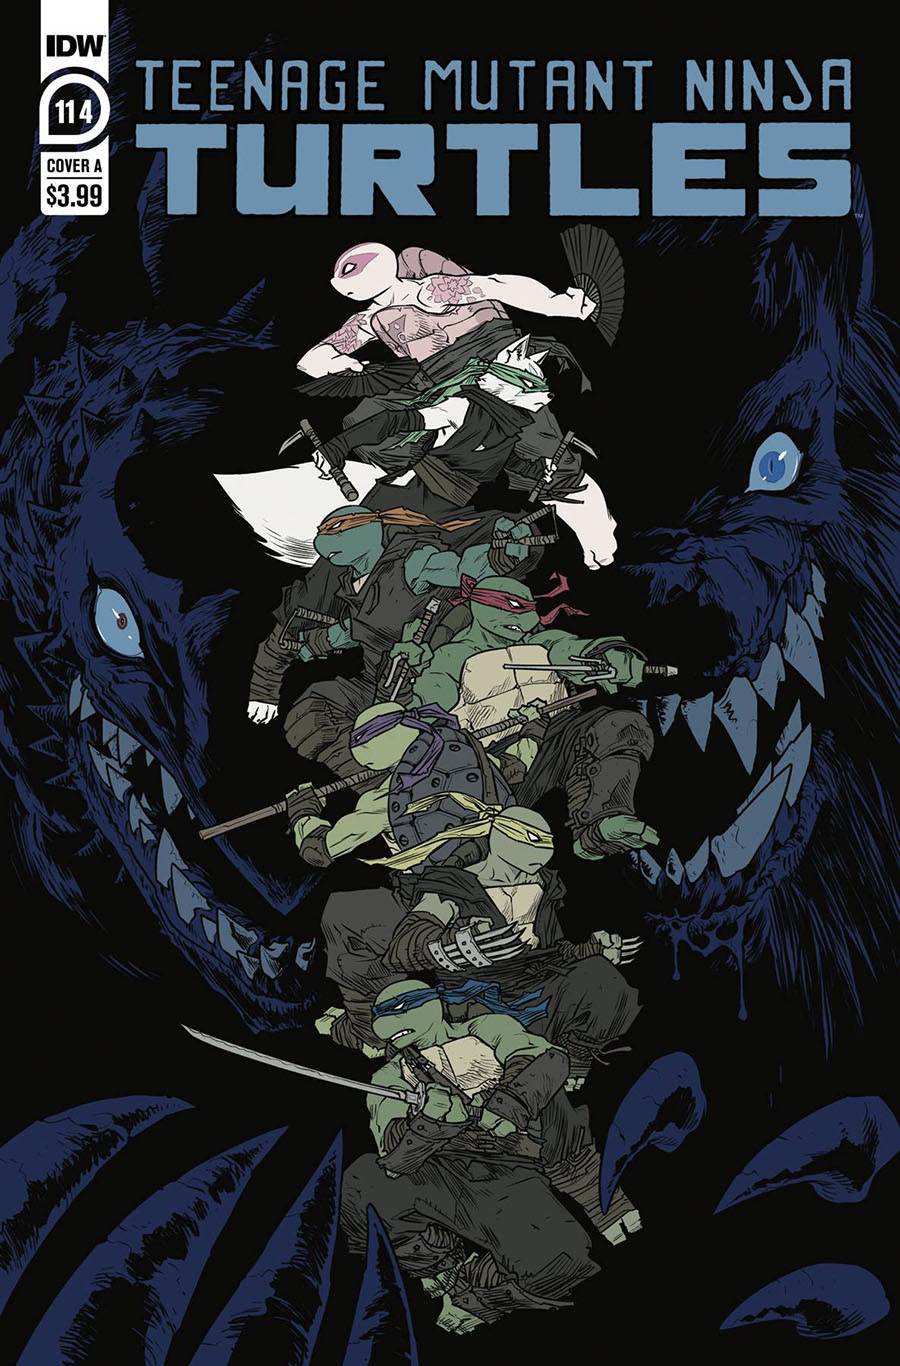 Teenage Mutant Ninja Turtles Vol 5 #114 Cover A Regular Sophie Campbell Cover